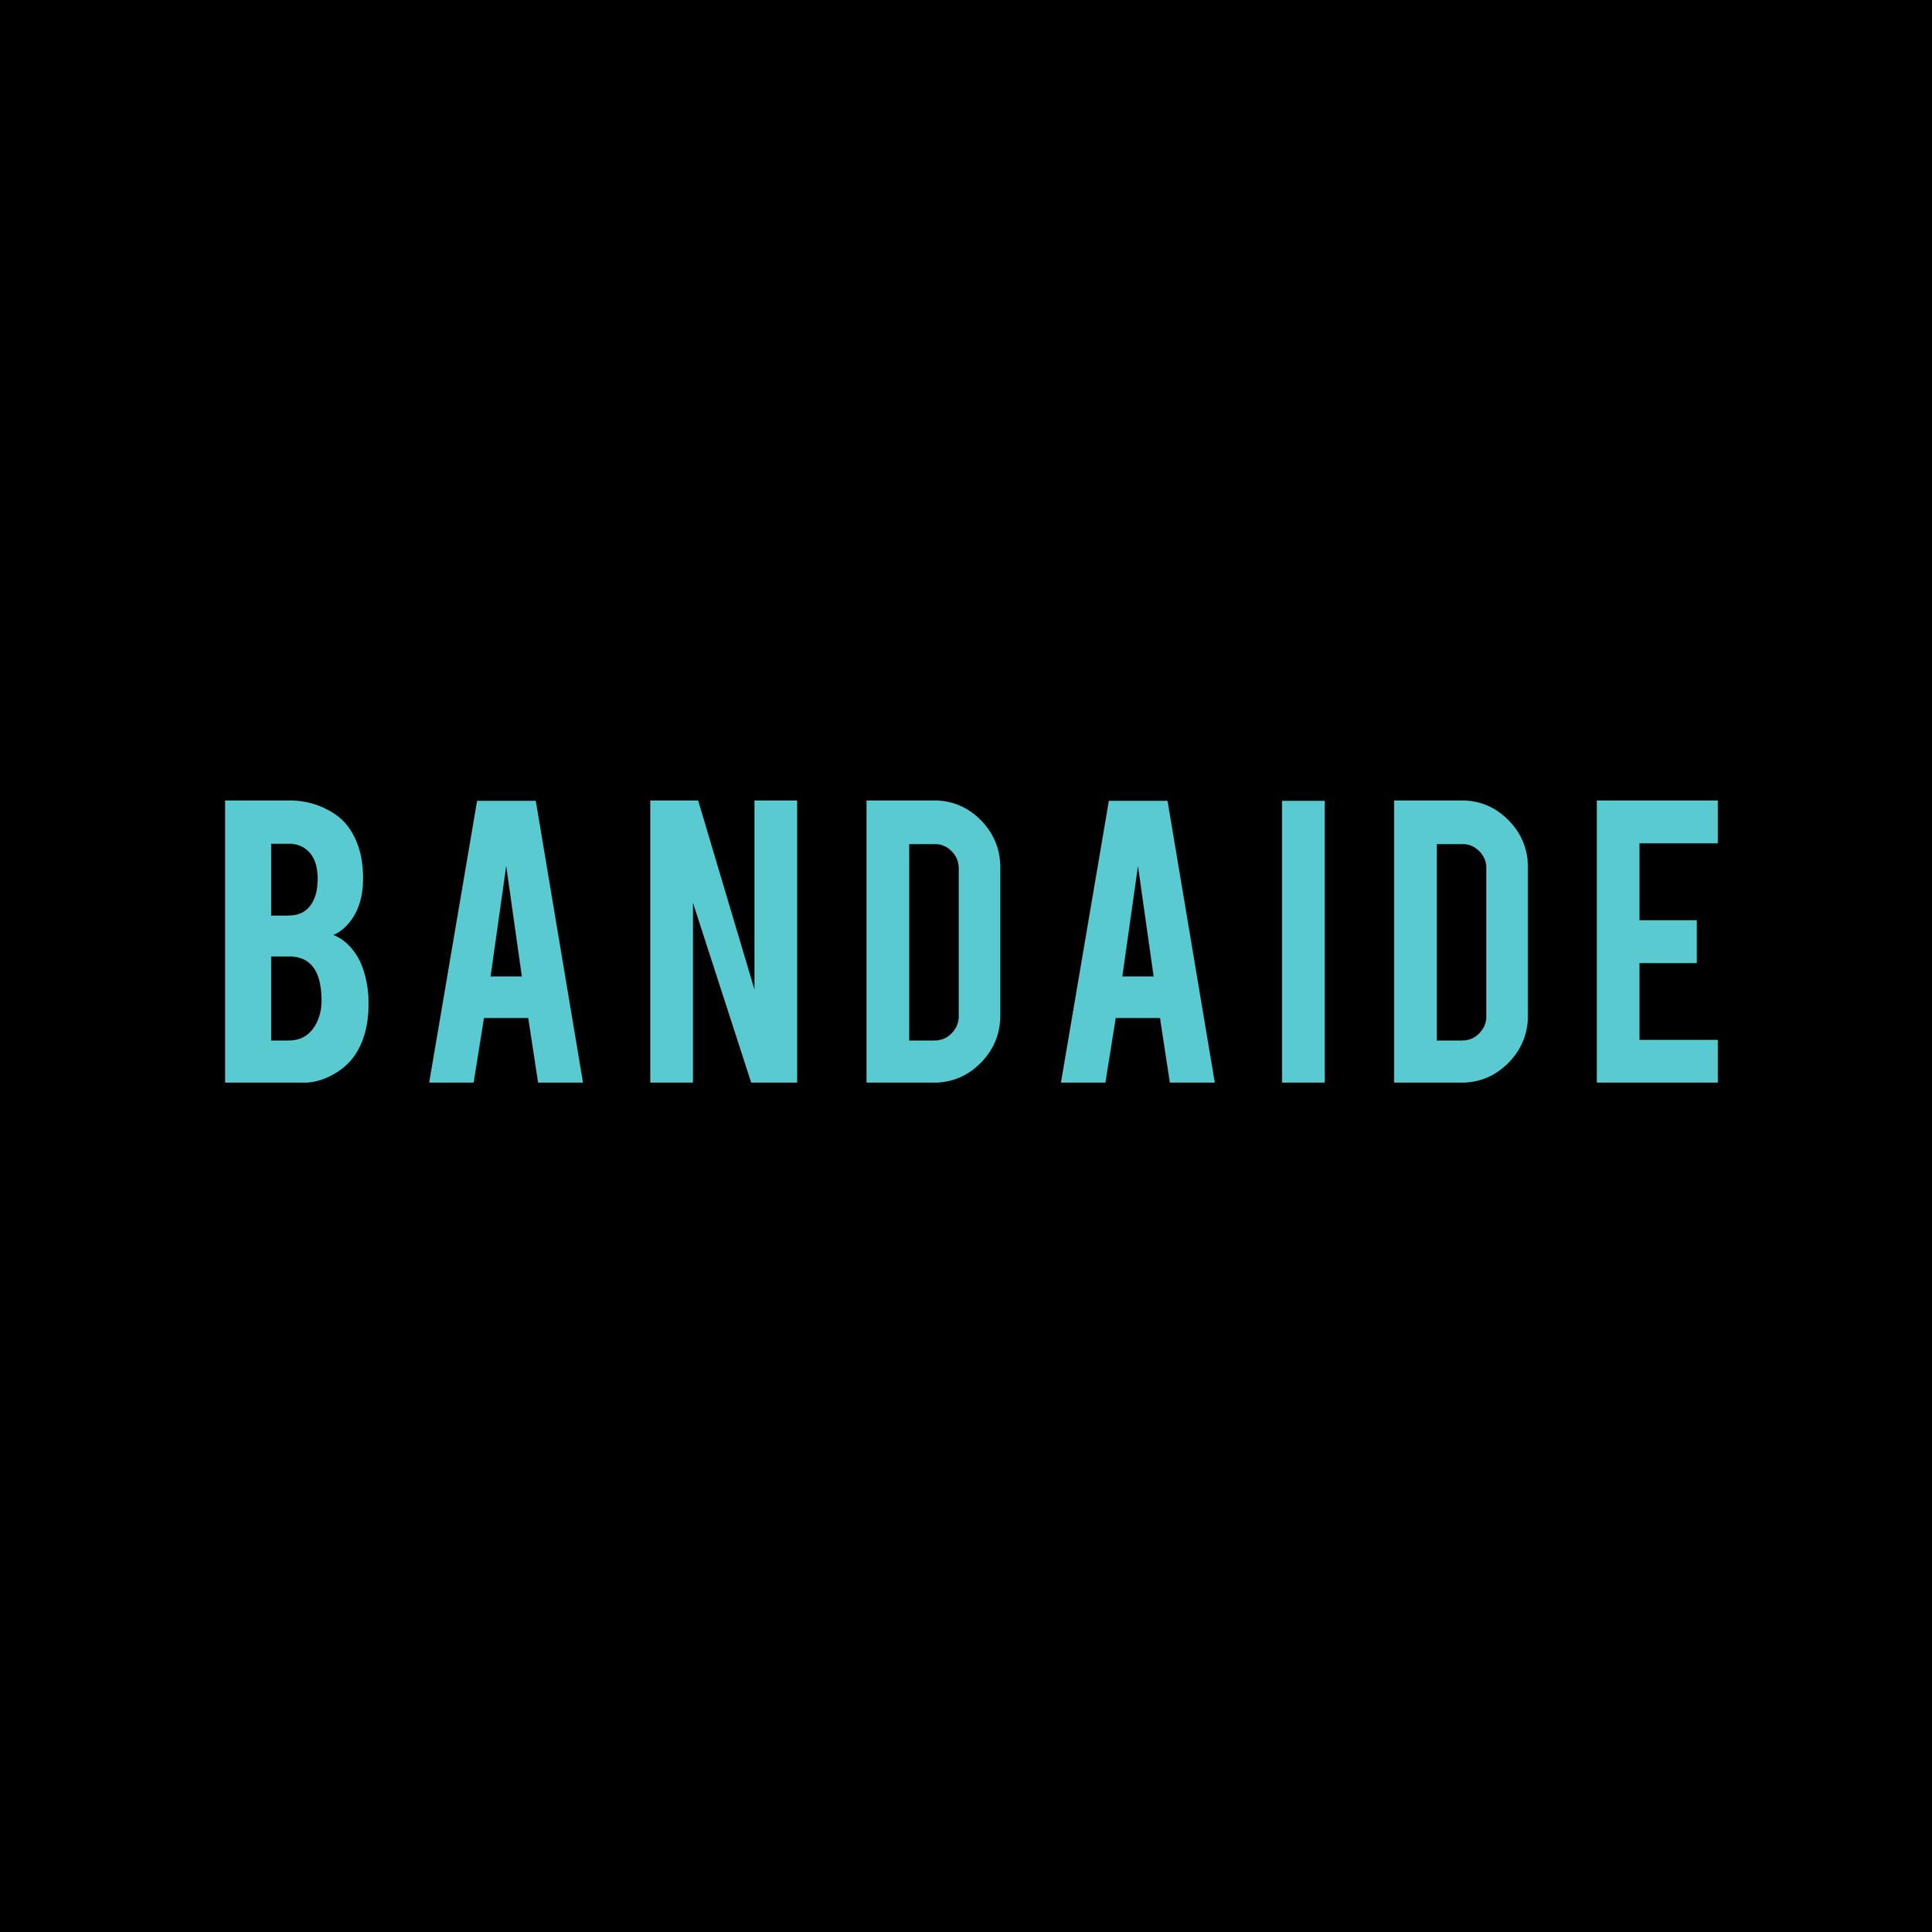 bandaide logo 2sq.jpg